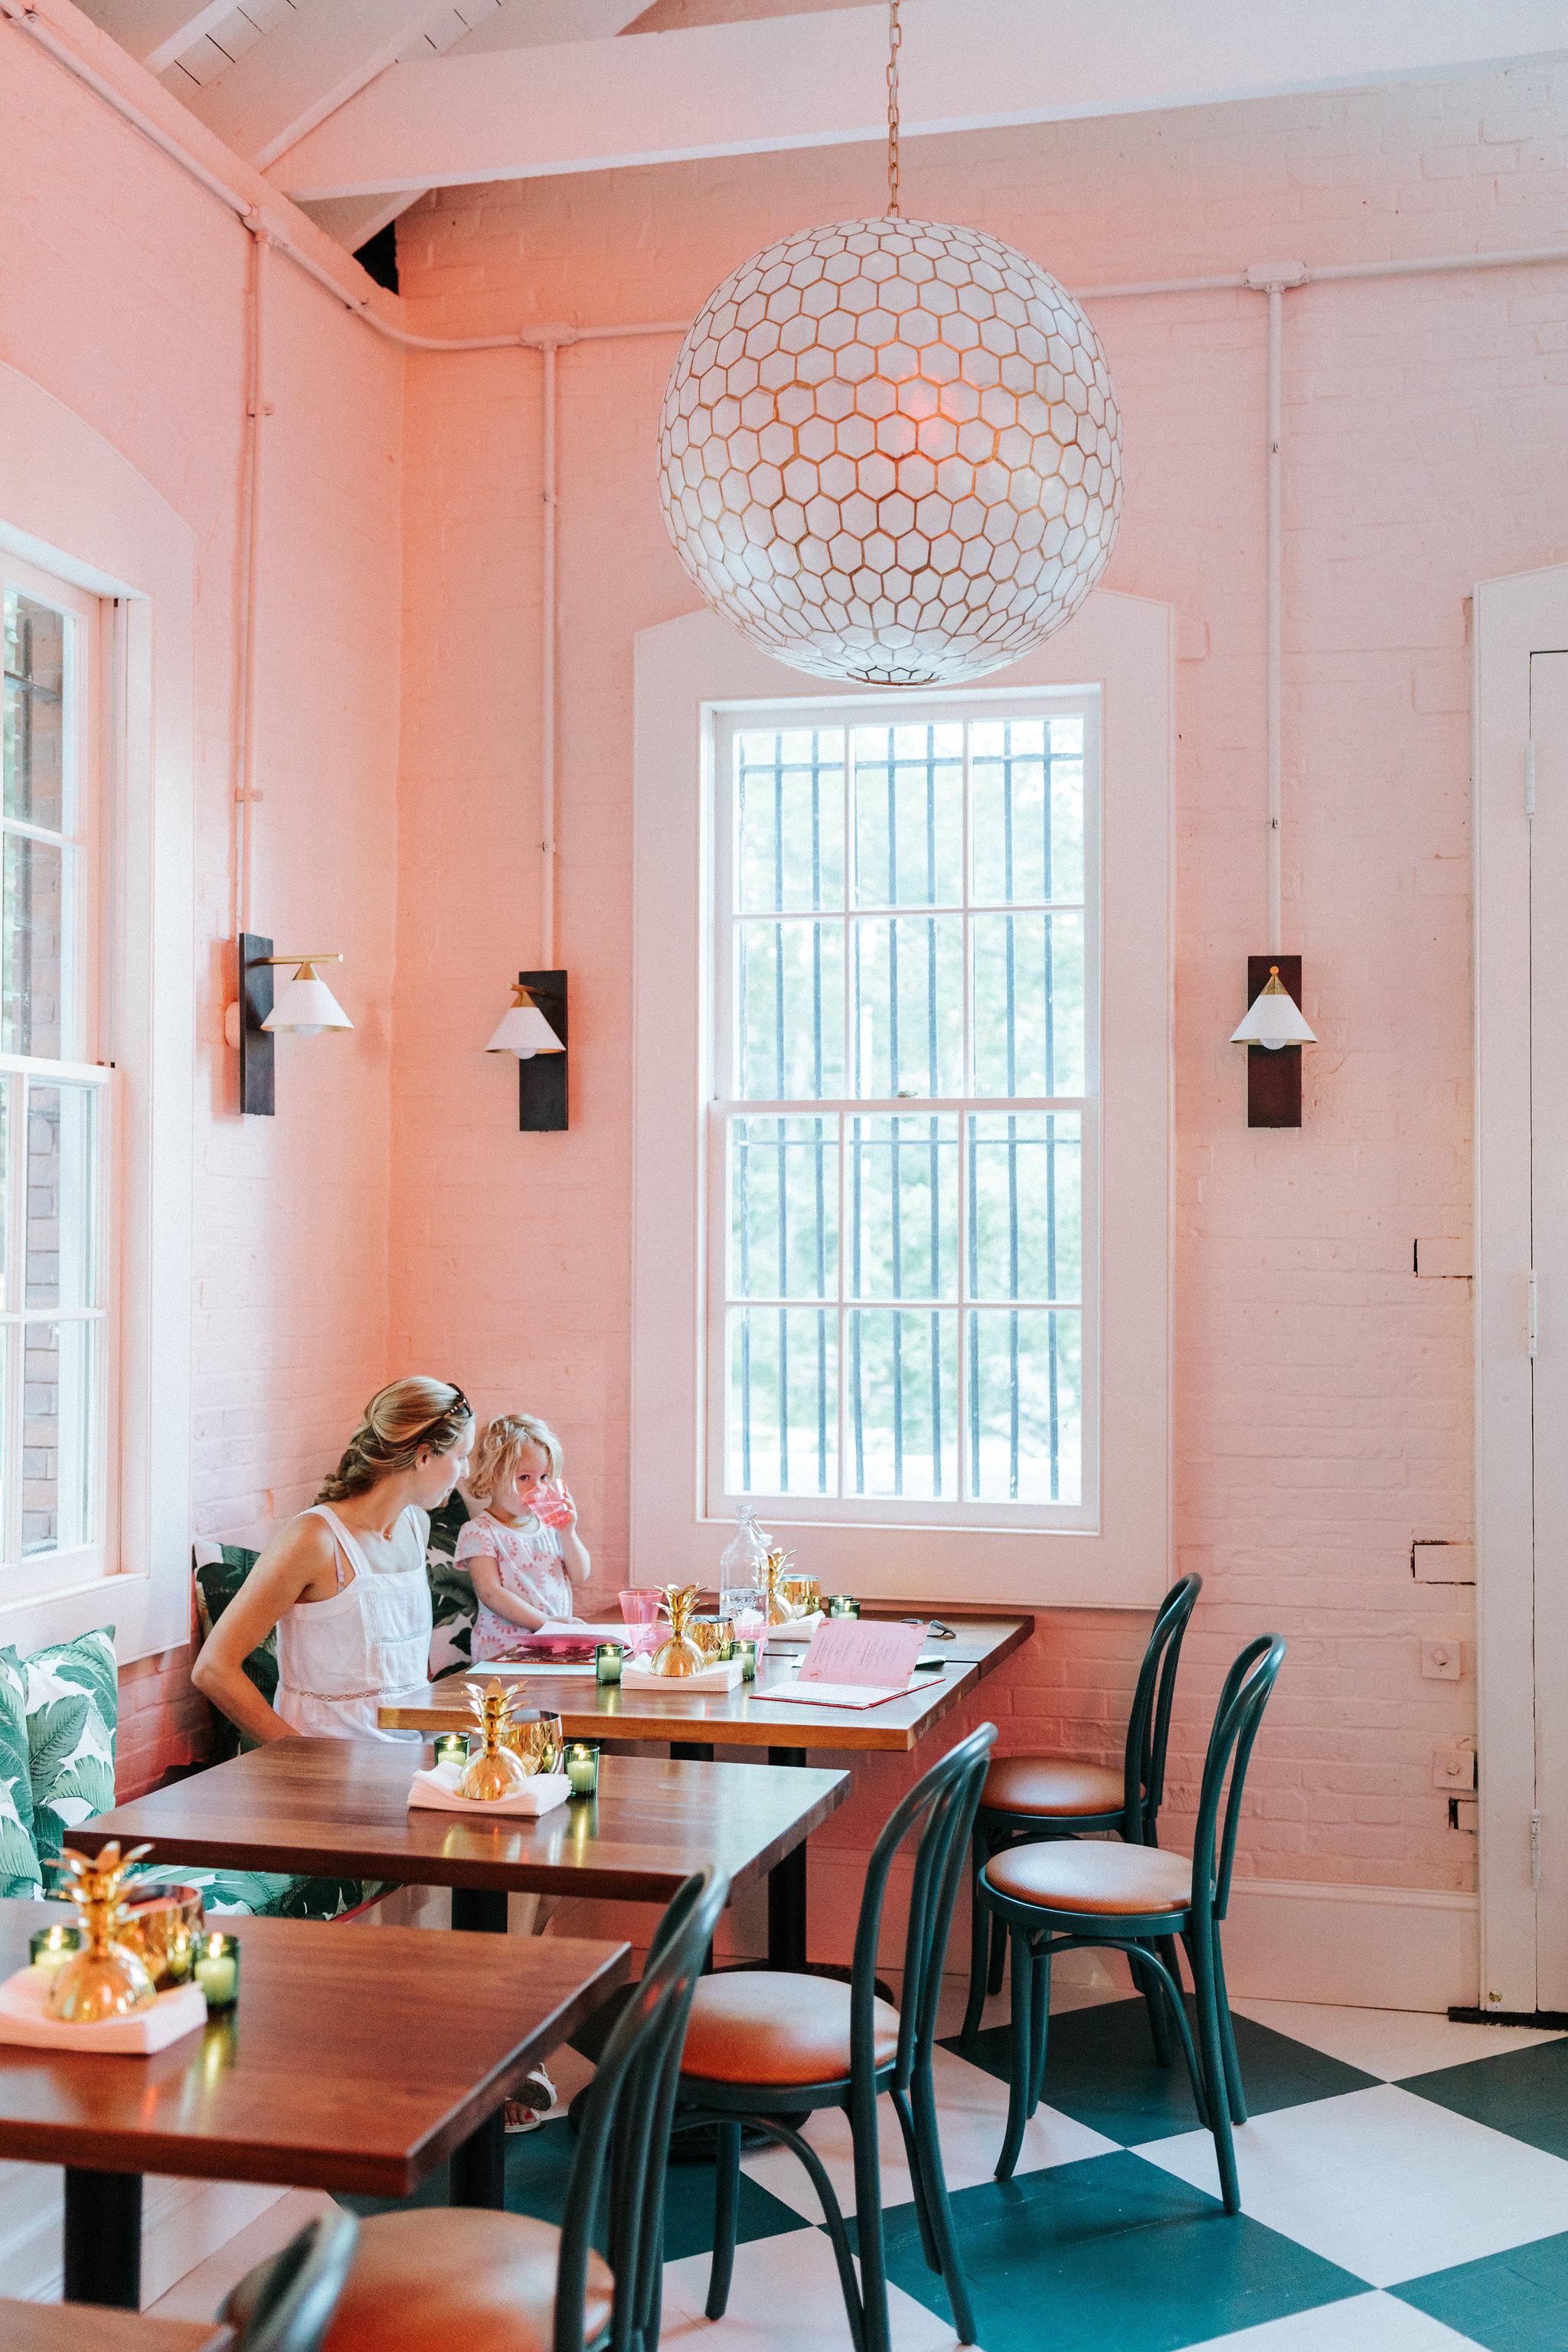 Crown_Jewel_Portland_Maine_Island_Restaurant-016.jpg